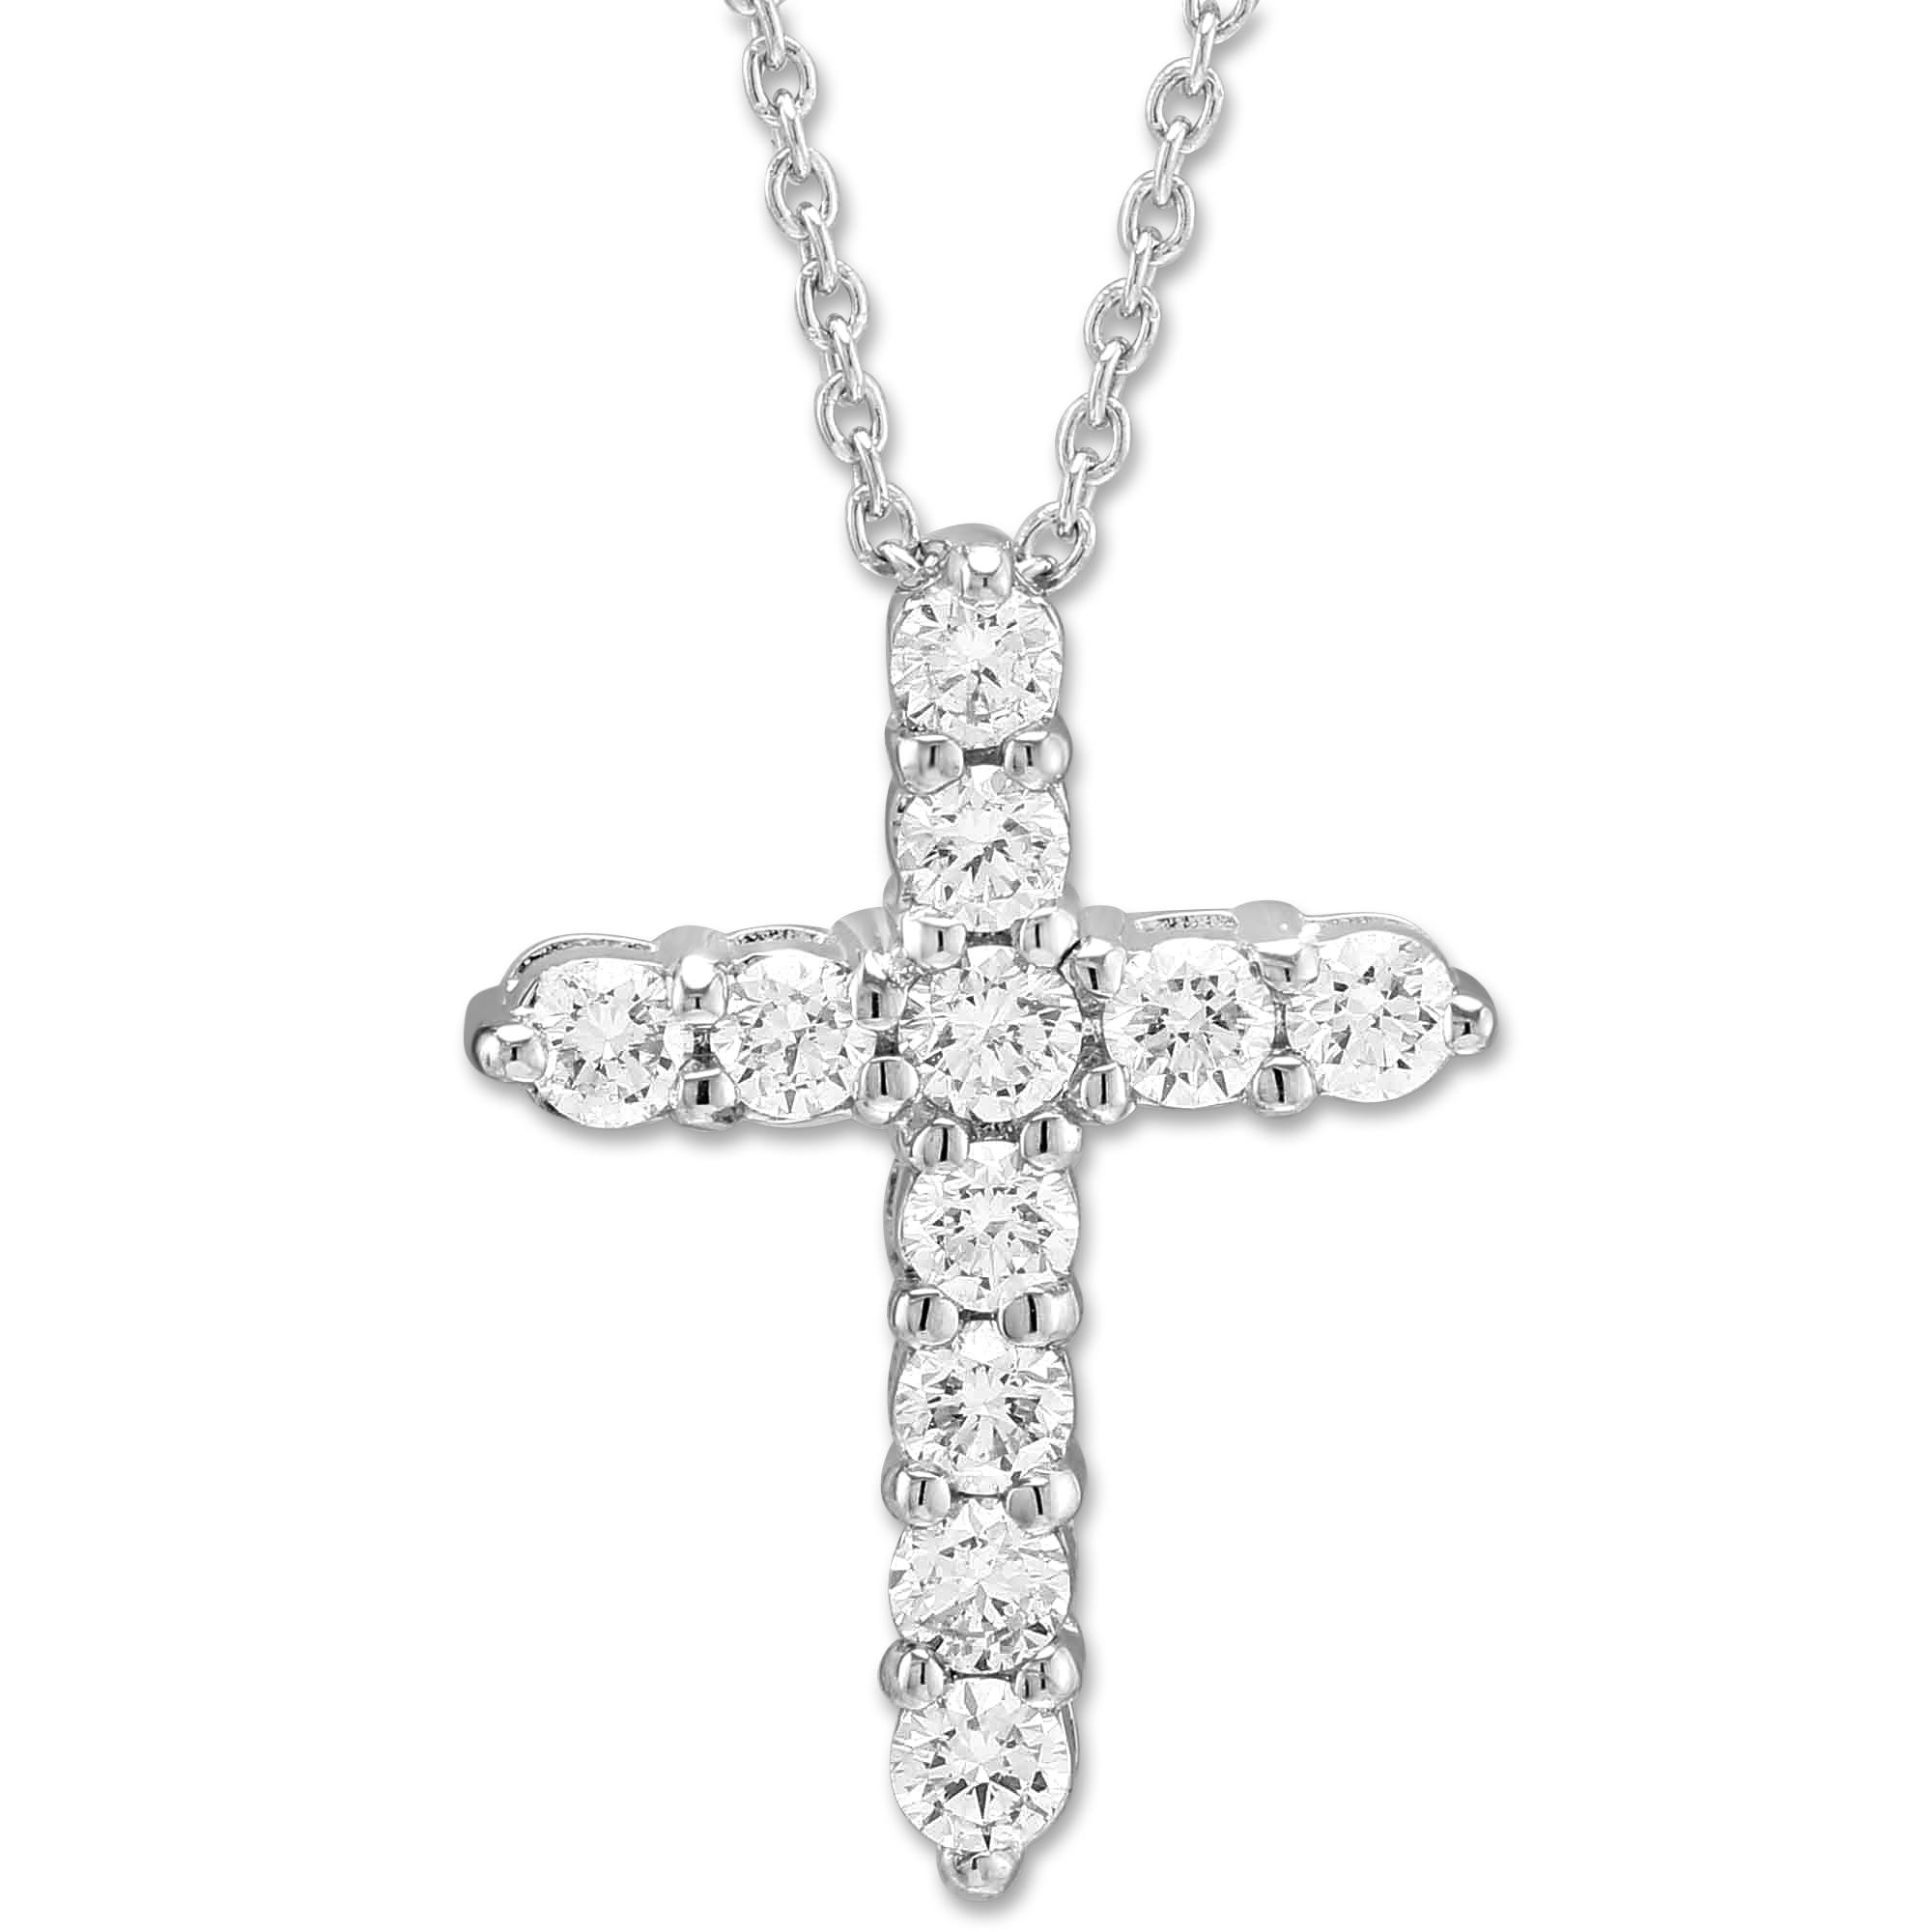 Roberto coin 18k white gold diamond cross pendantnecklace 045cttw roberto coin 18k white gold diamond cross pendantnecklace 045cttw aloadofball Gallery